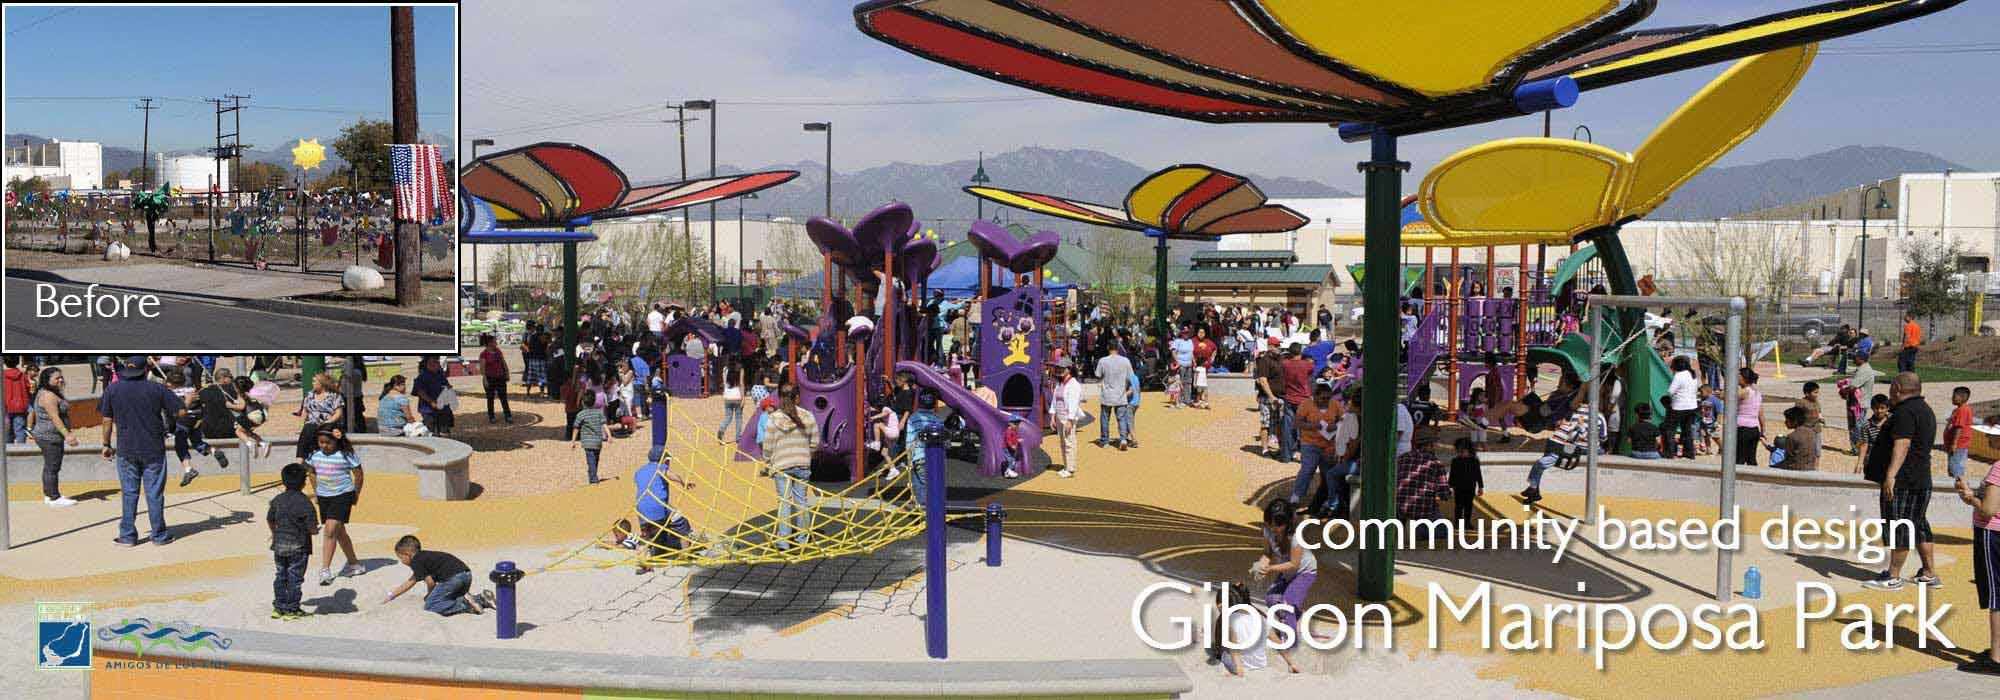 Gibson Mariposa Park